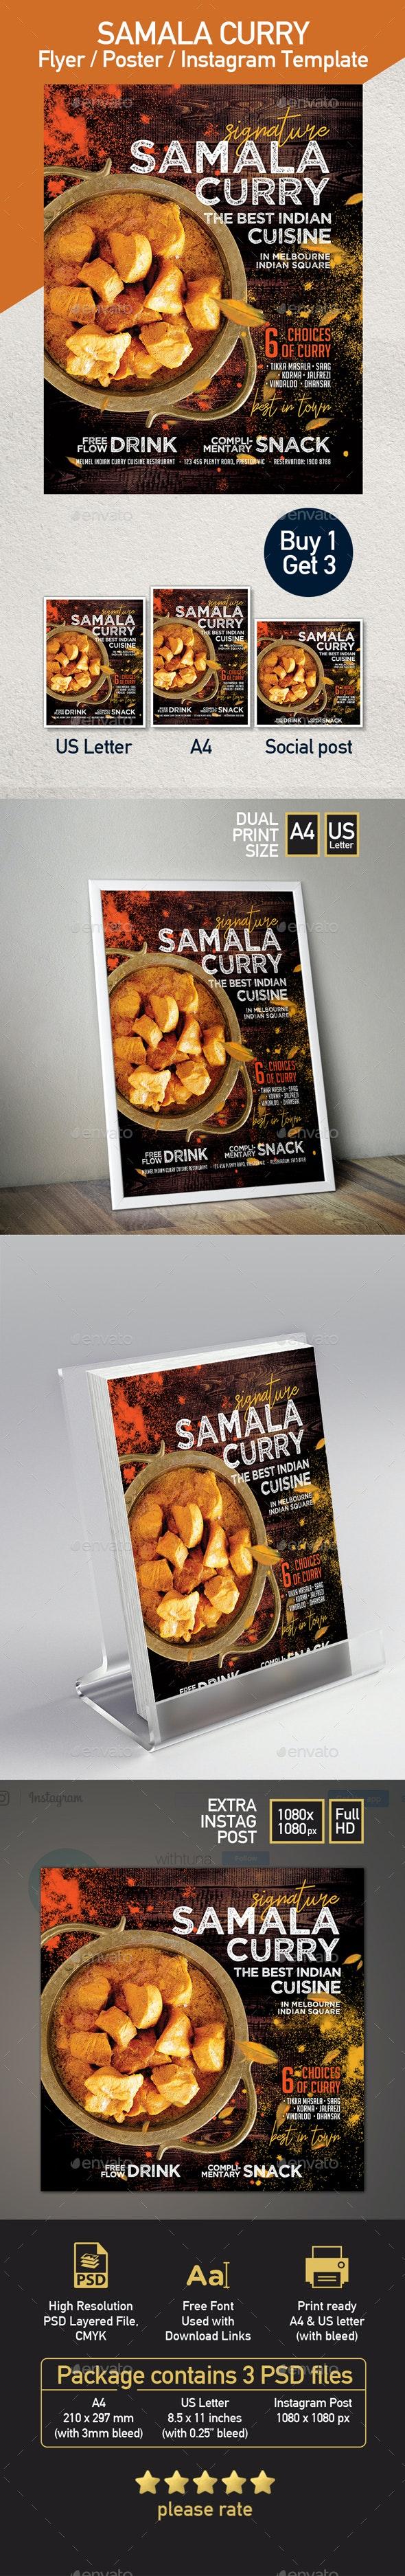 Indian Cuisine Restaurant flyer - Set of 3 Templates - Restaurant Flyers